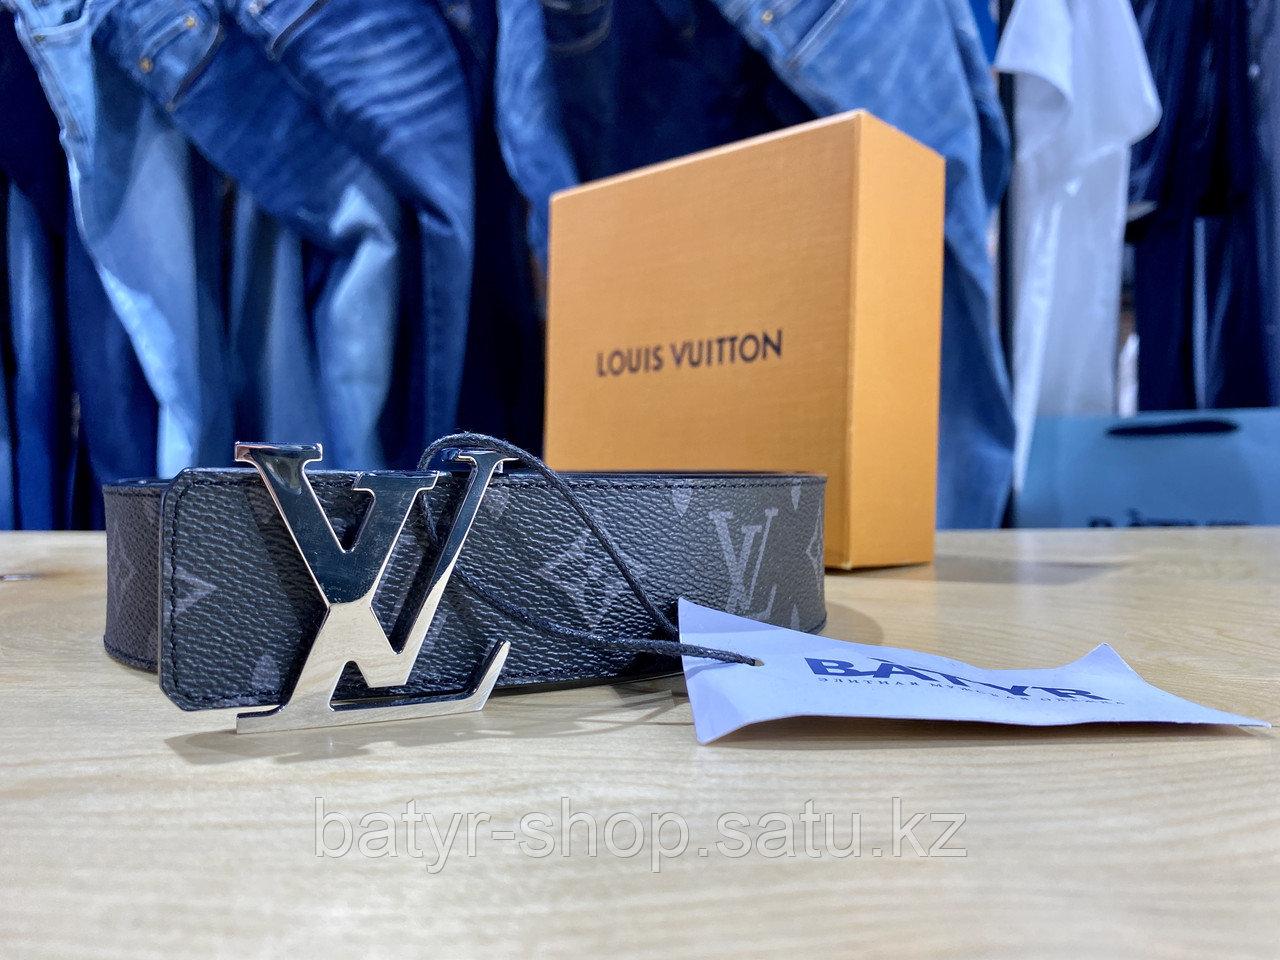 Ремень Louis Vuitton (0031)